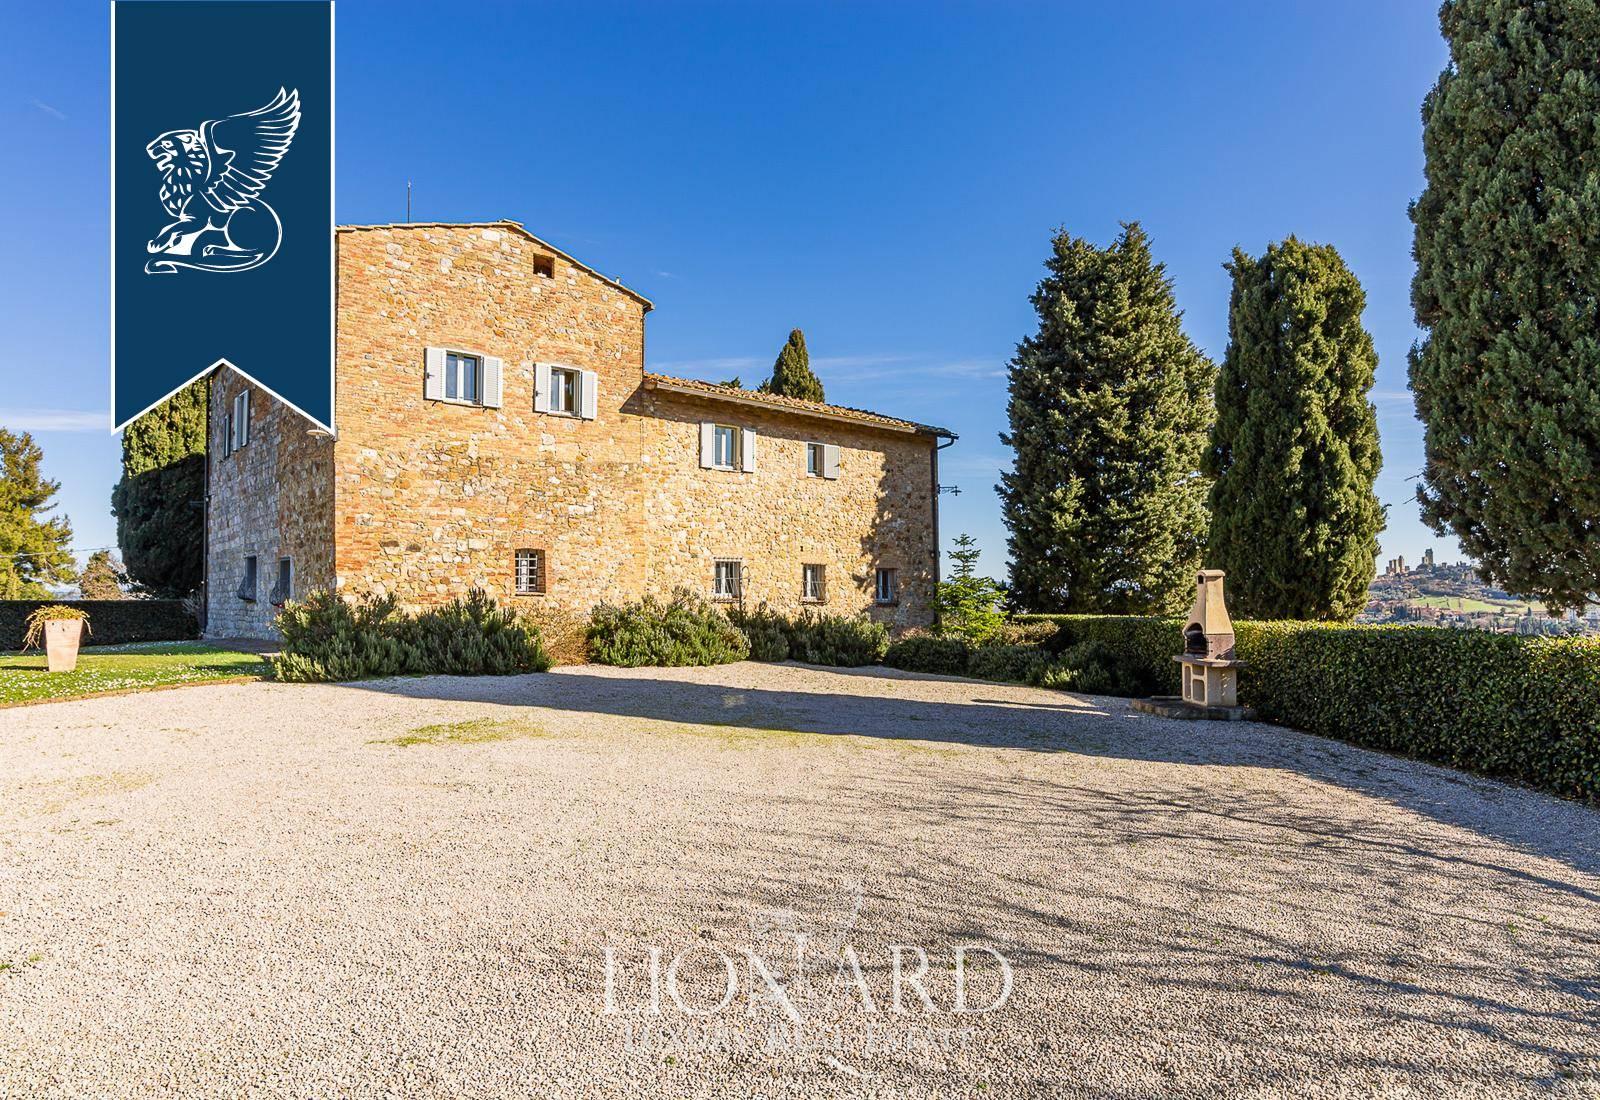 Agriturismo in Vendita a San Gimignano: 0 locali, 649 mq - Foto 4